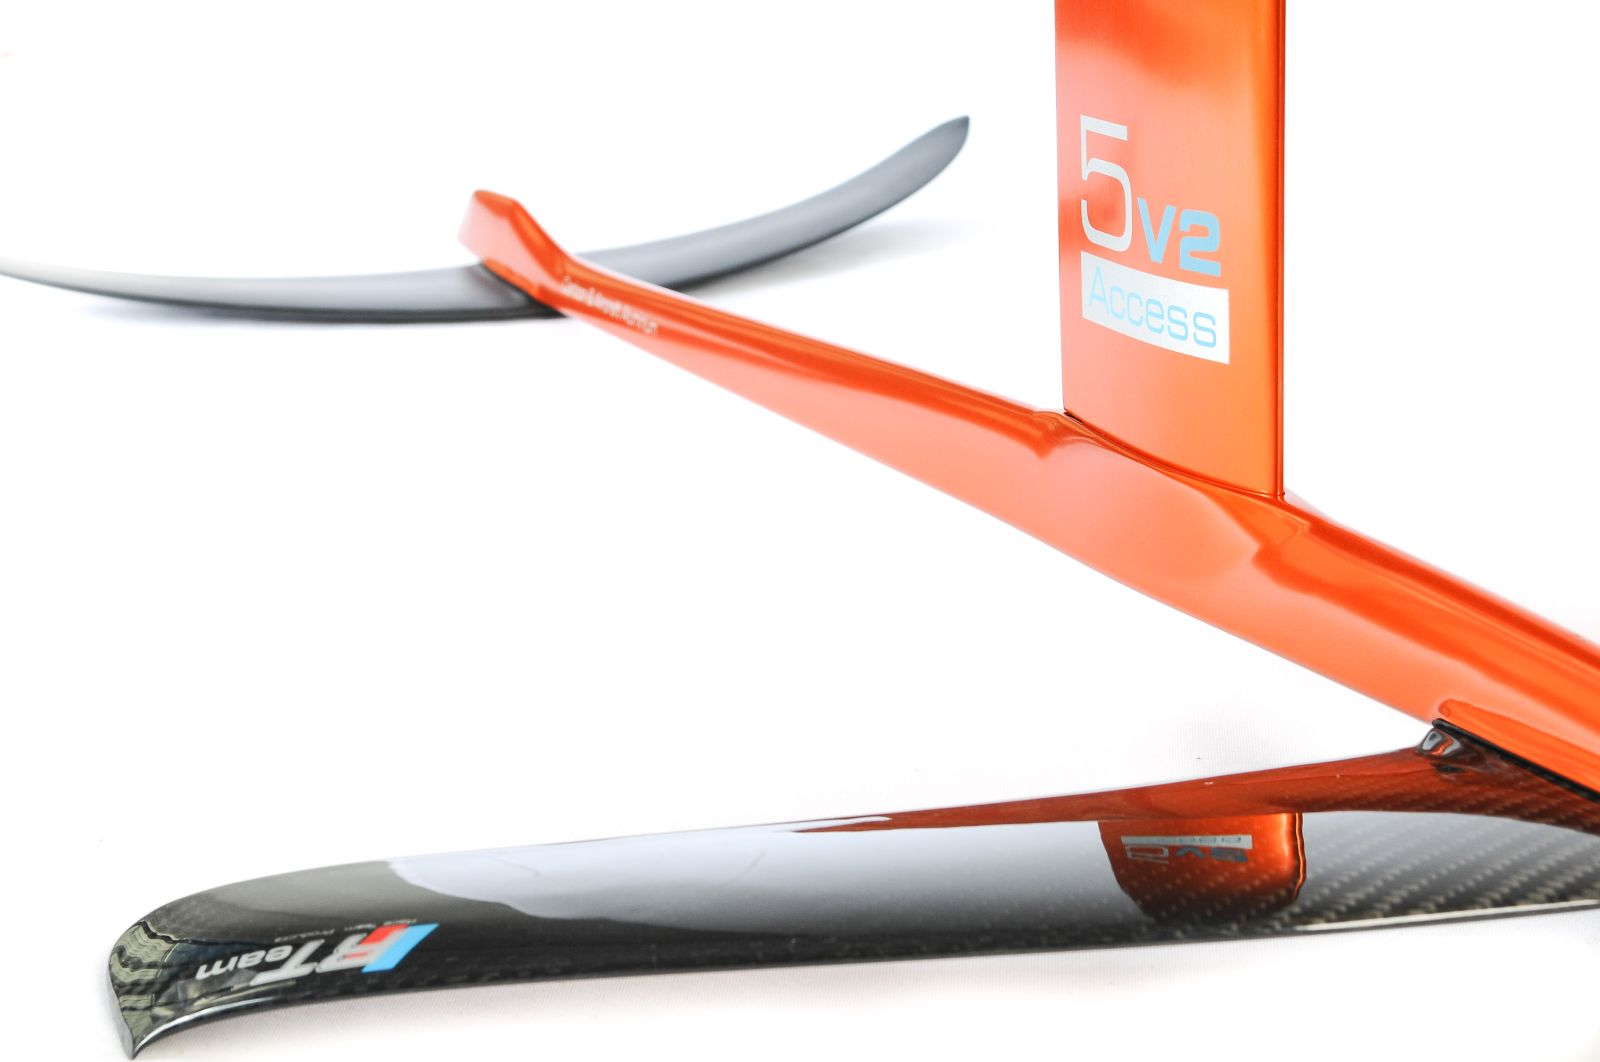 Kitefoil carbon aluminium alpinefoil 5 0 access v2 2522 1